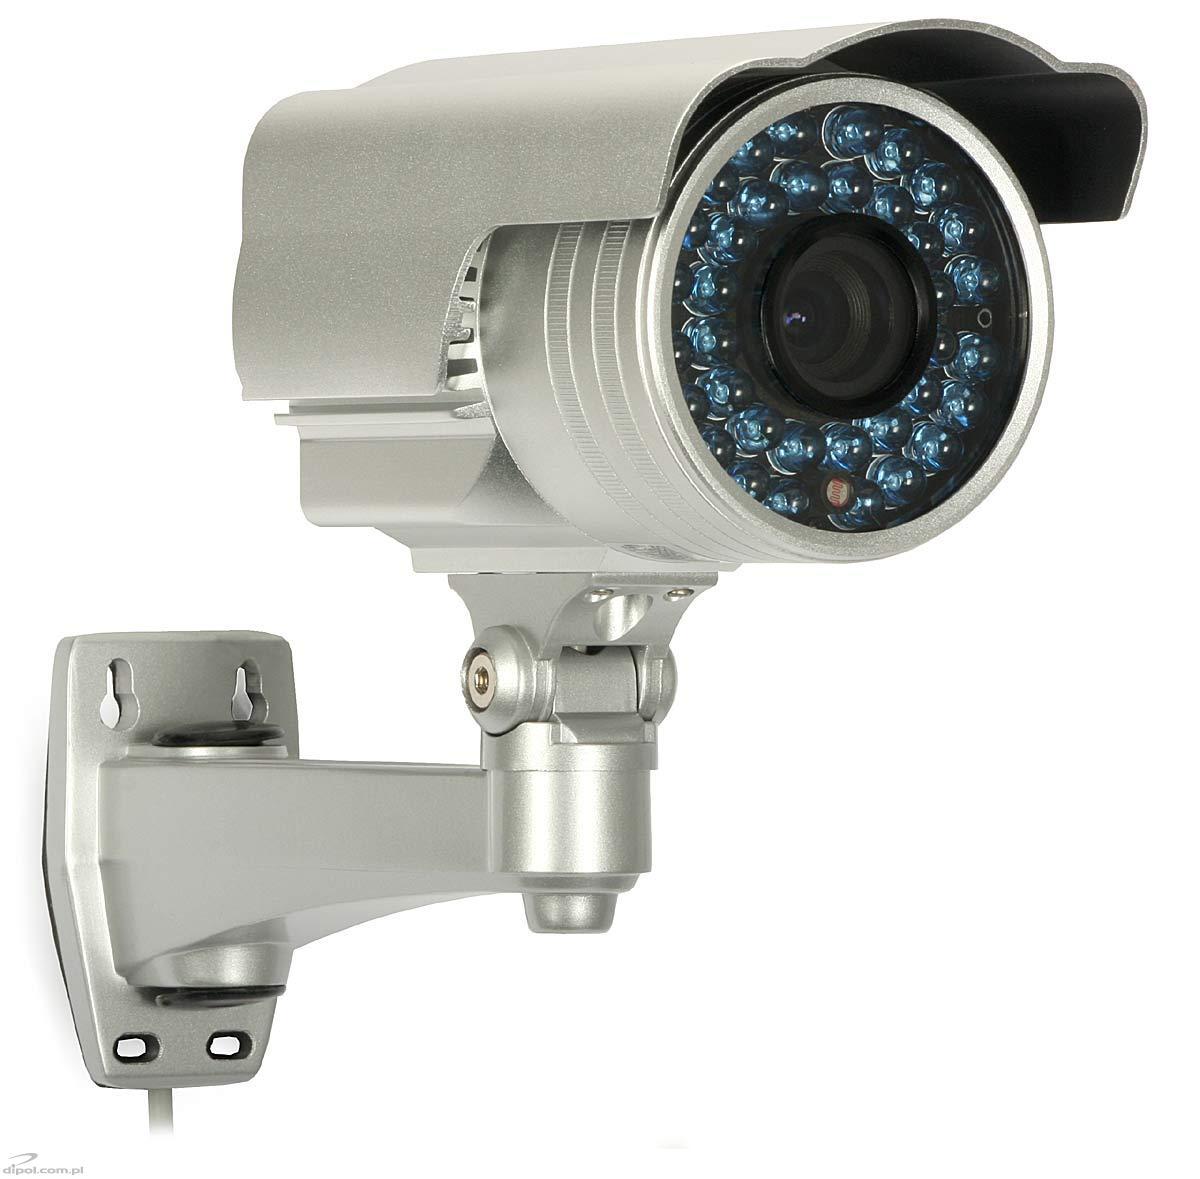 cctv cameras security secura security from delhi india. Black Bedroom Furniture Sets. Home Design Ideas